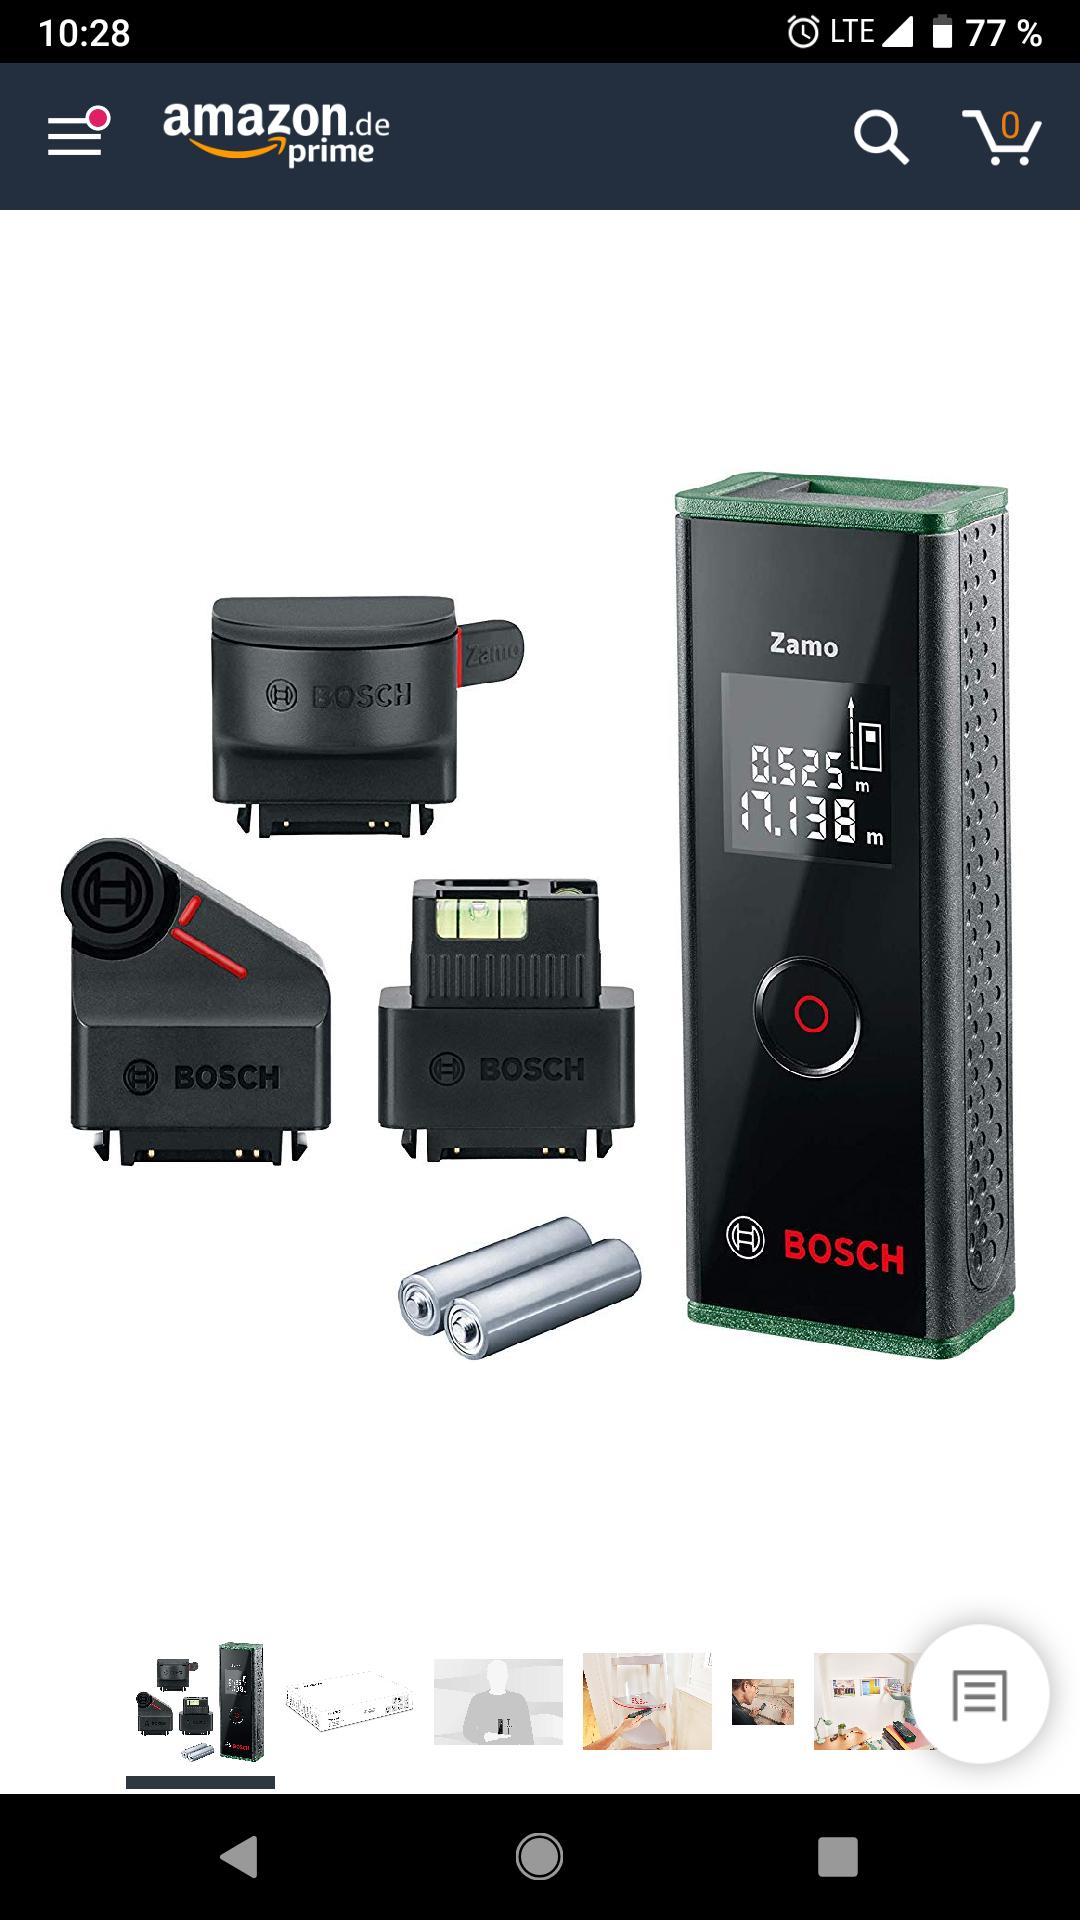 Bosch Laser Entfernungsmesser Zamo Set (3. Generation) - Amazon Tagesdeal